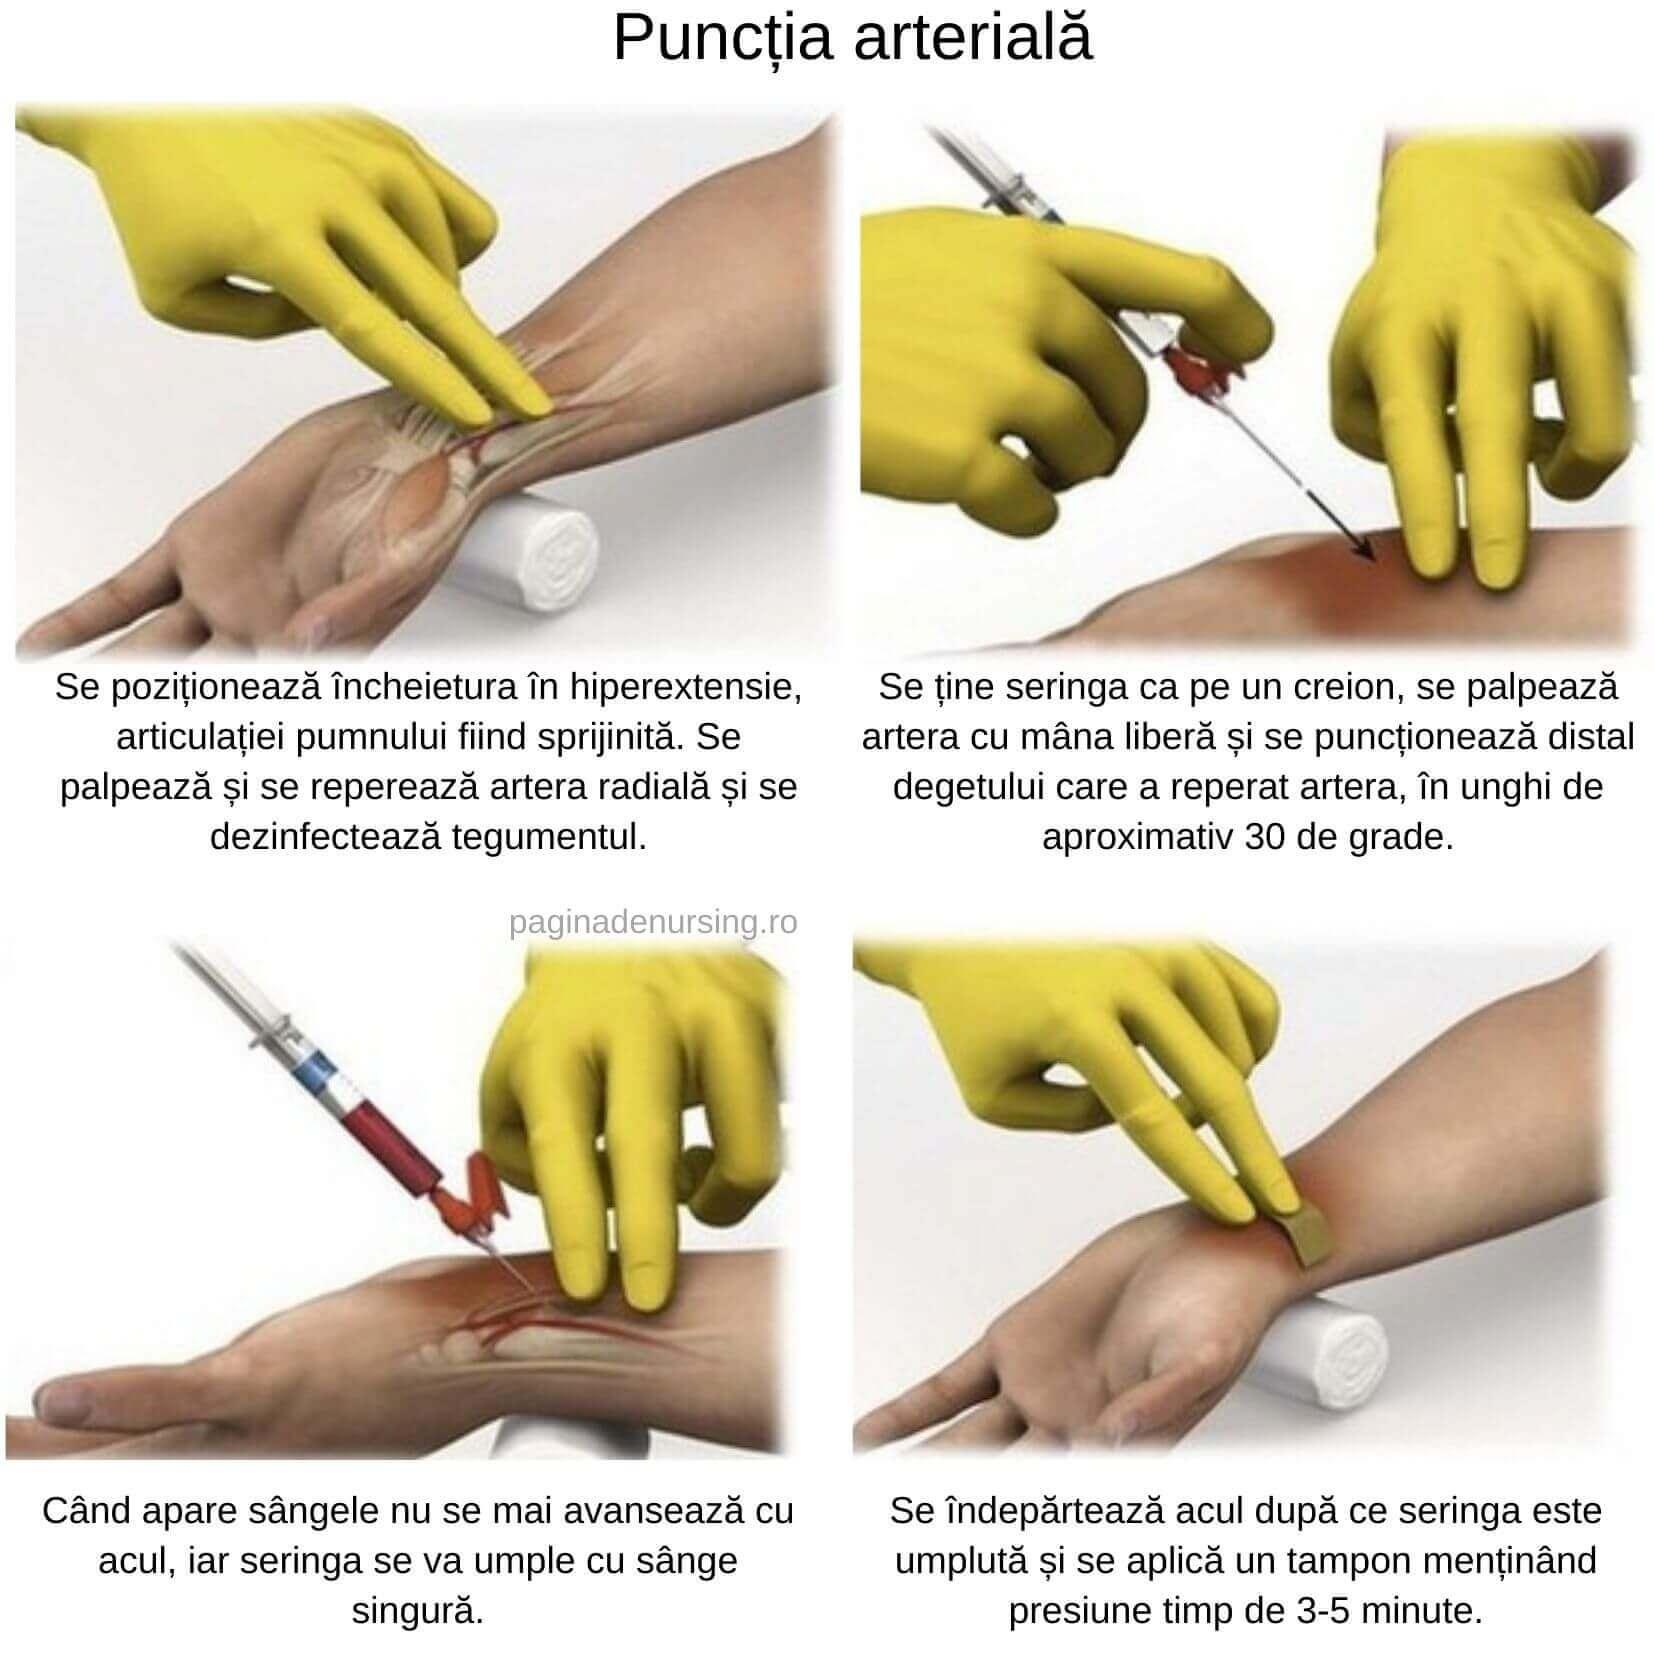 punctia arteriala tehnica pasi paginadenursing